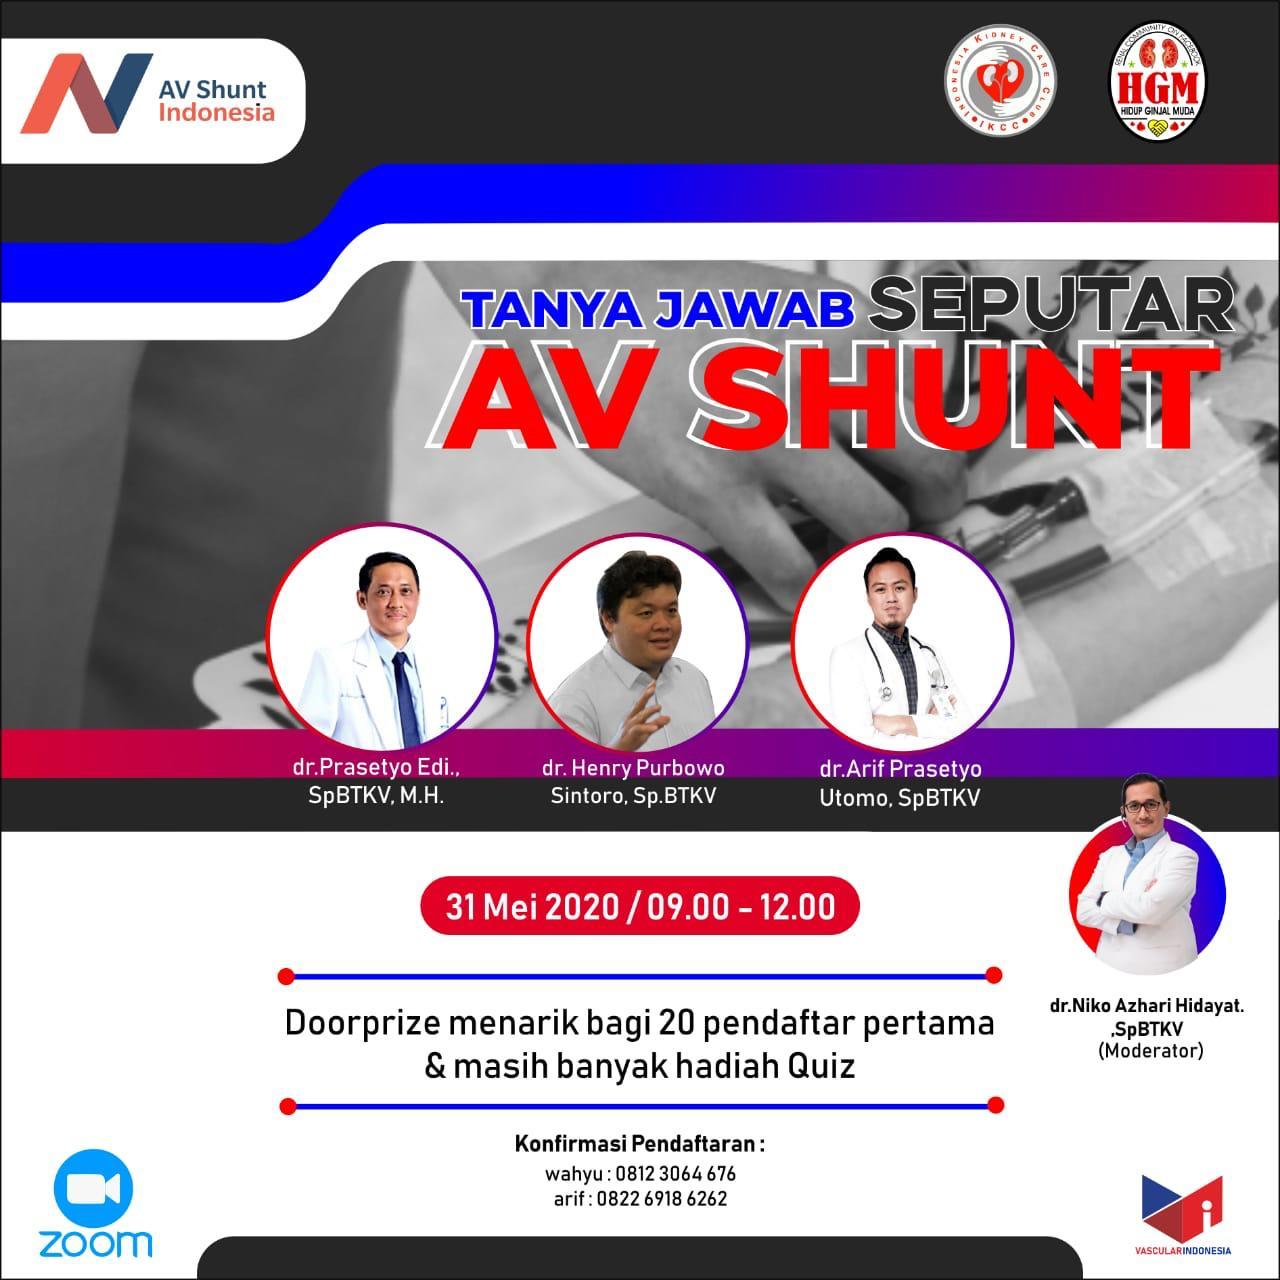 http://avshuntindonesia.com/images/blog/BLOG__webinar-avshunt-indonesia--tanya-jawab-seputar-avshunt--chapter-1__20200601102716.jpg